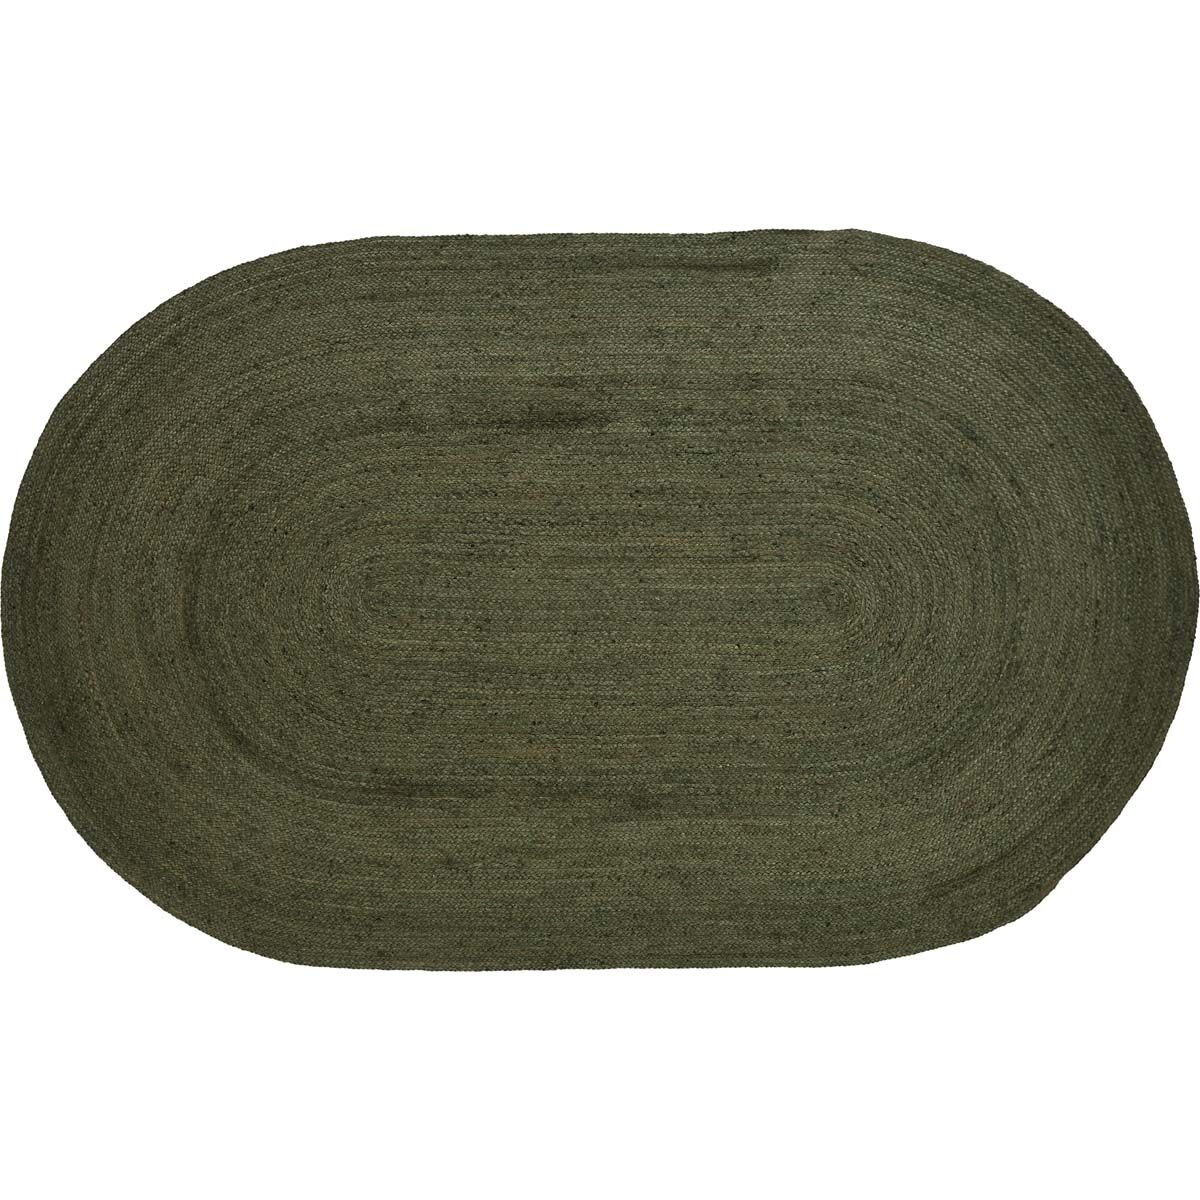 Regina Rustic & Lodge Flooring Oval Rug Rug Size: 60x96